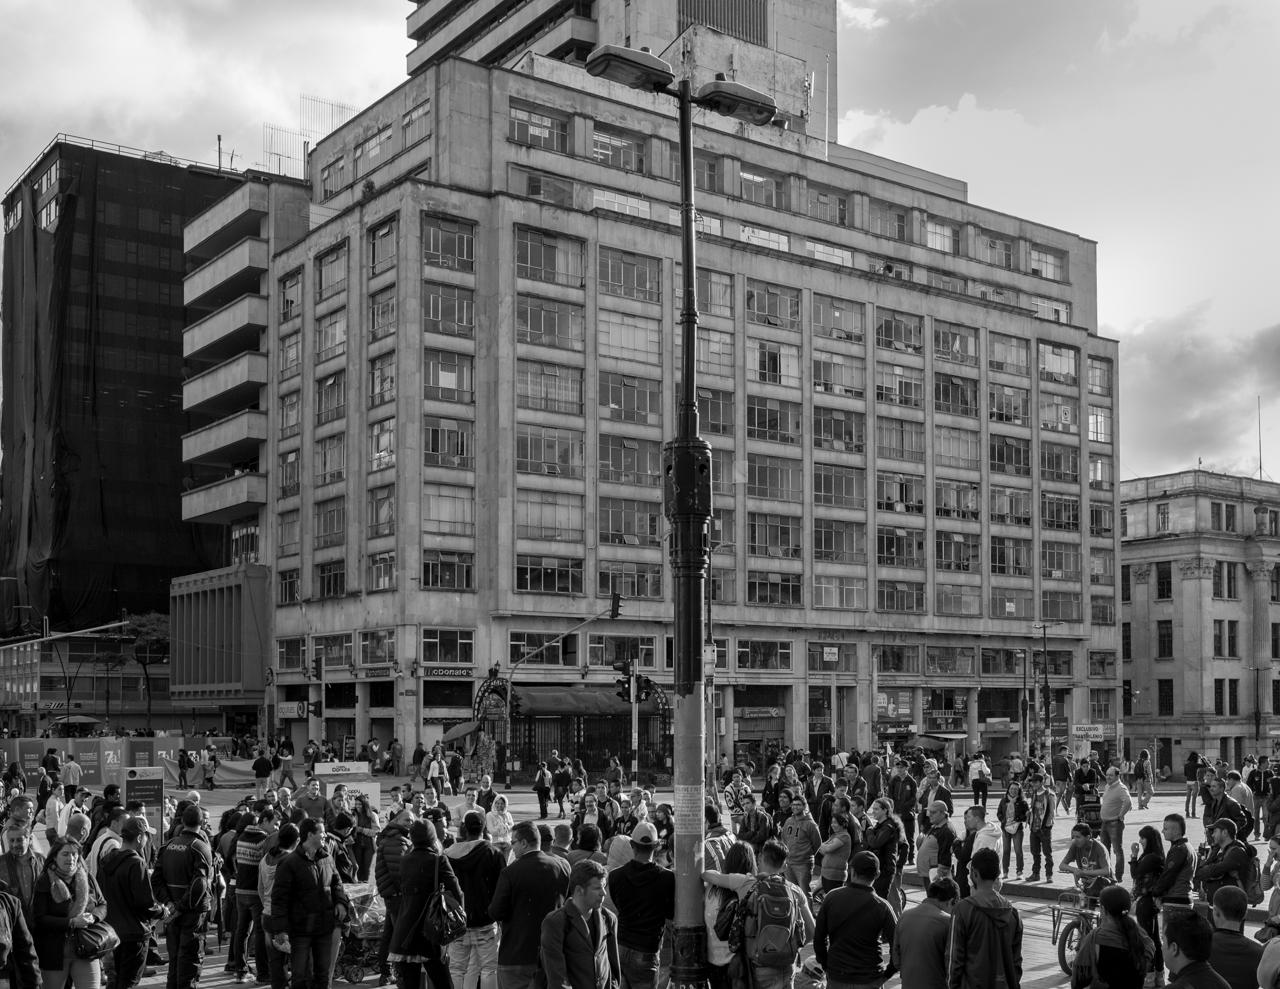 The historical intersection of Avenida Jimenez and Carrera Séptima on July 28, 2015. (Juan Cristóbal Cobo)